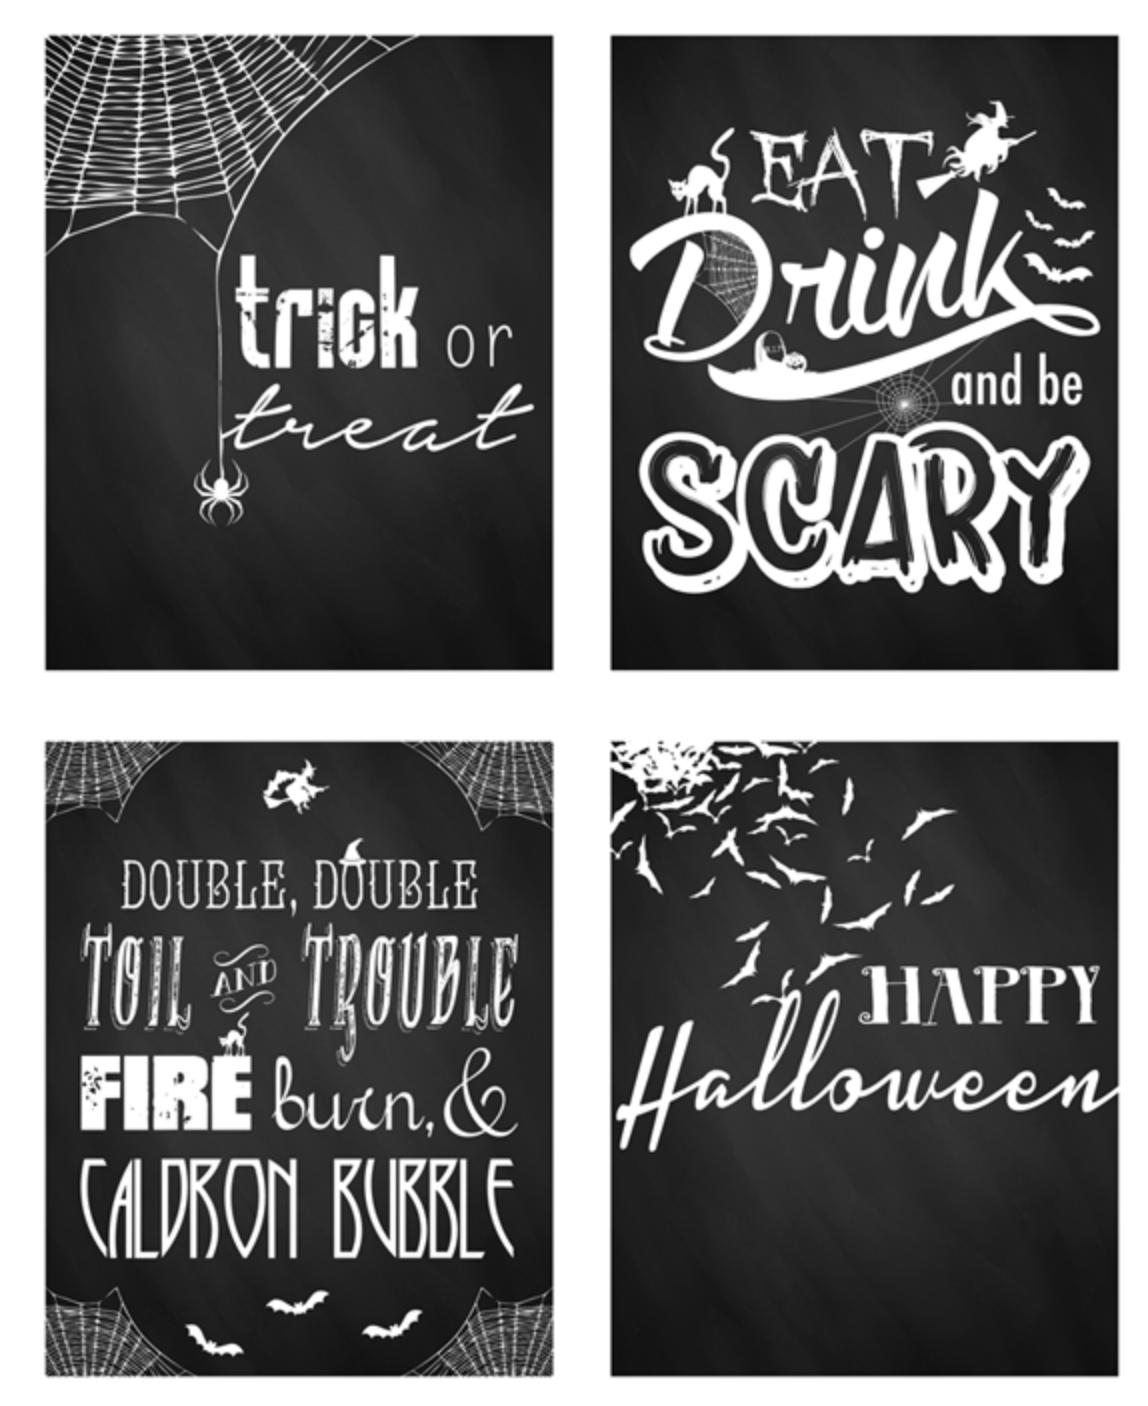 60 Free Printable Halloween Decorations